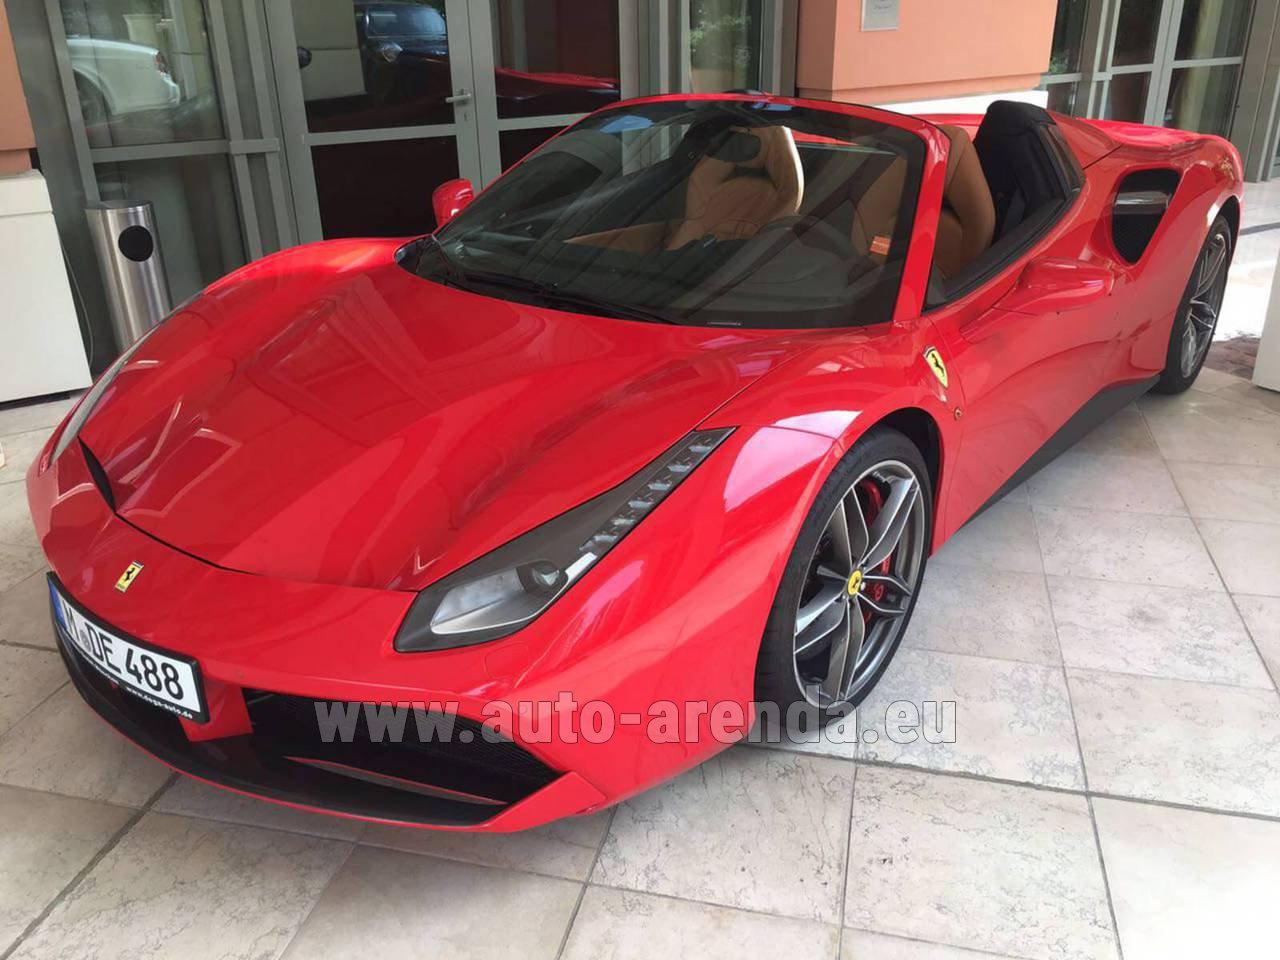 Rent Ferrari 488 Gtb Spider Cabrio In Aéroport Chambéry Savoie Mont Blanc Cmf Auto Arenda